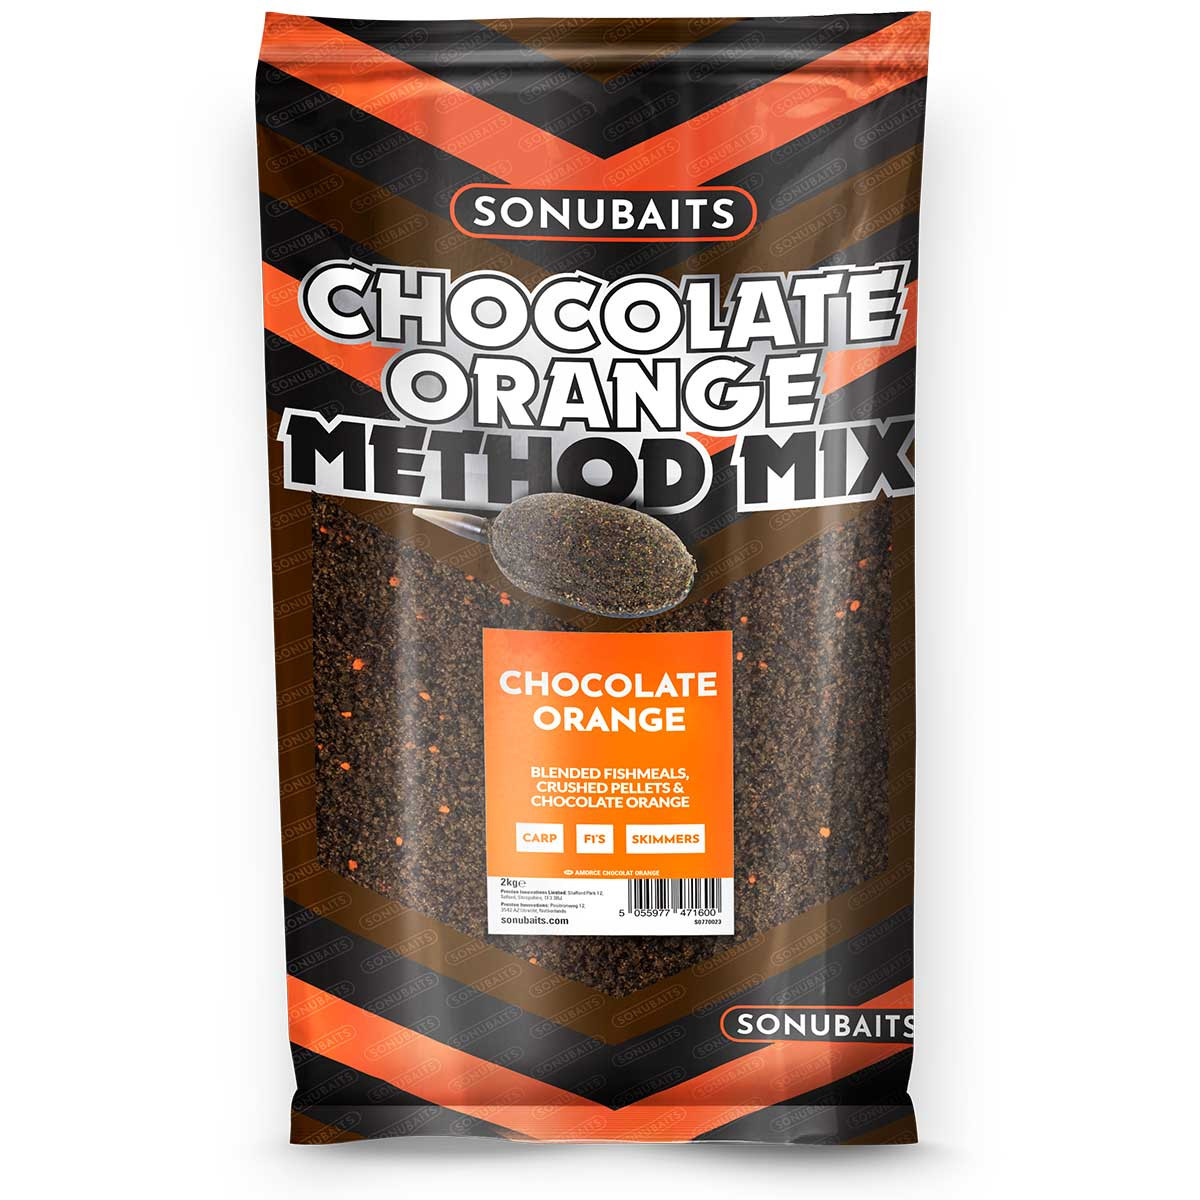 Sonubaits Chocolate orange method mix